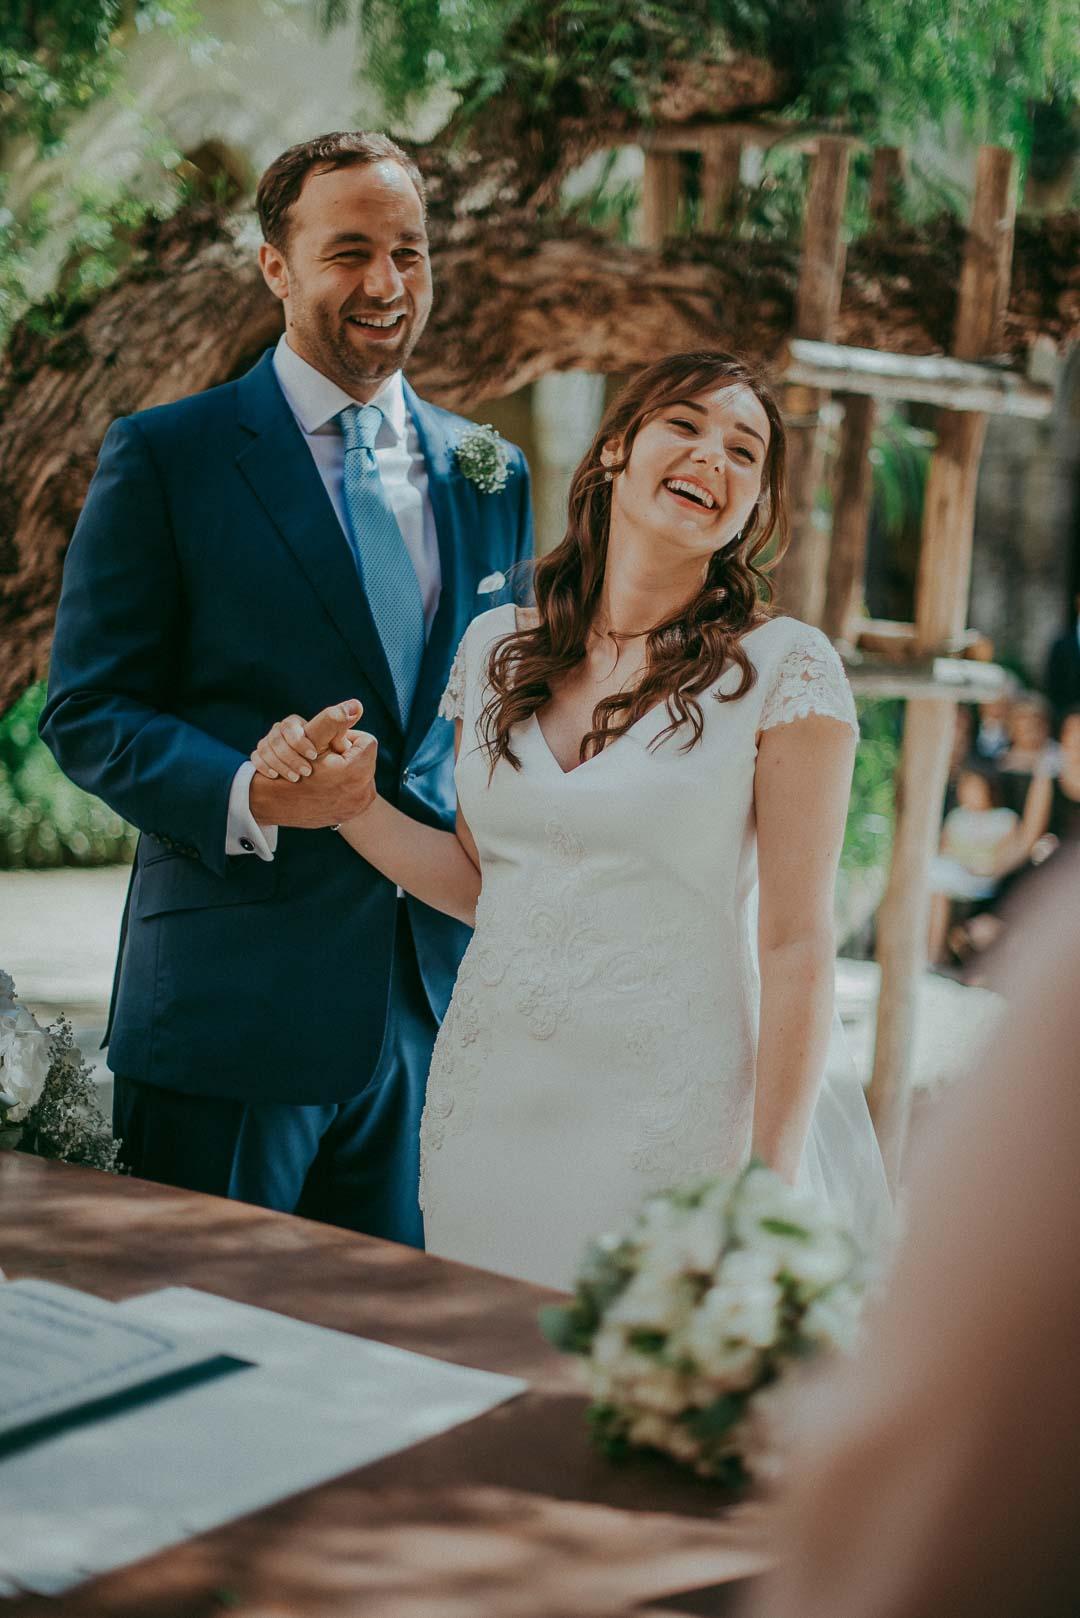 wedding-photographer-destination-fineart-bespoke-reportage-sorrento-parcodeiprincipi-vivianeizzo-spazio46-42